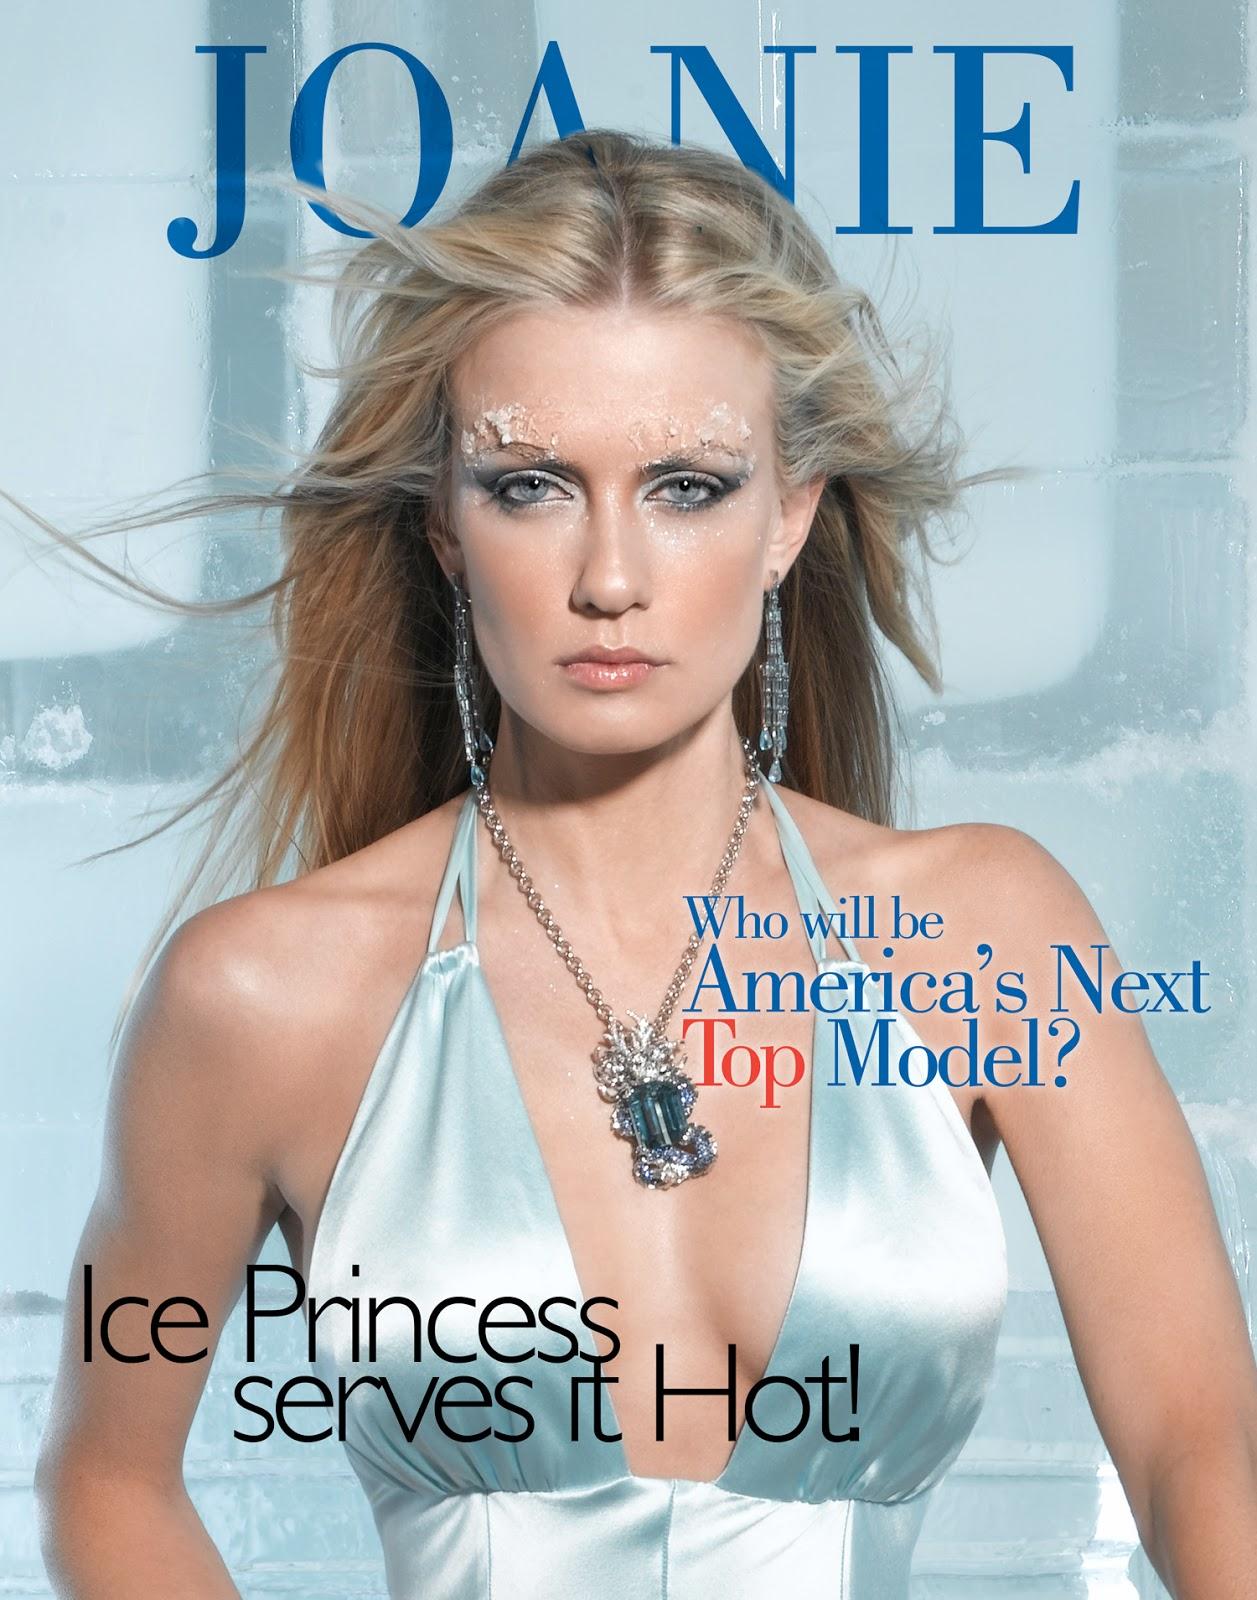 Next Top Model Blog: ANTM C6: Ice Princess Magazine Covers